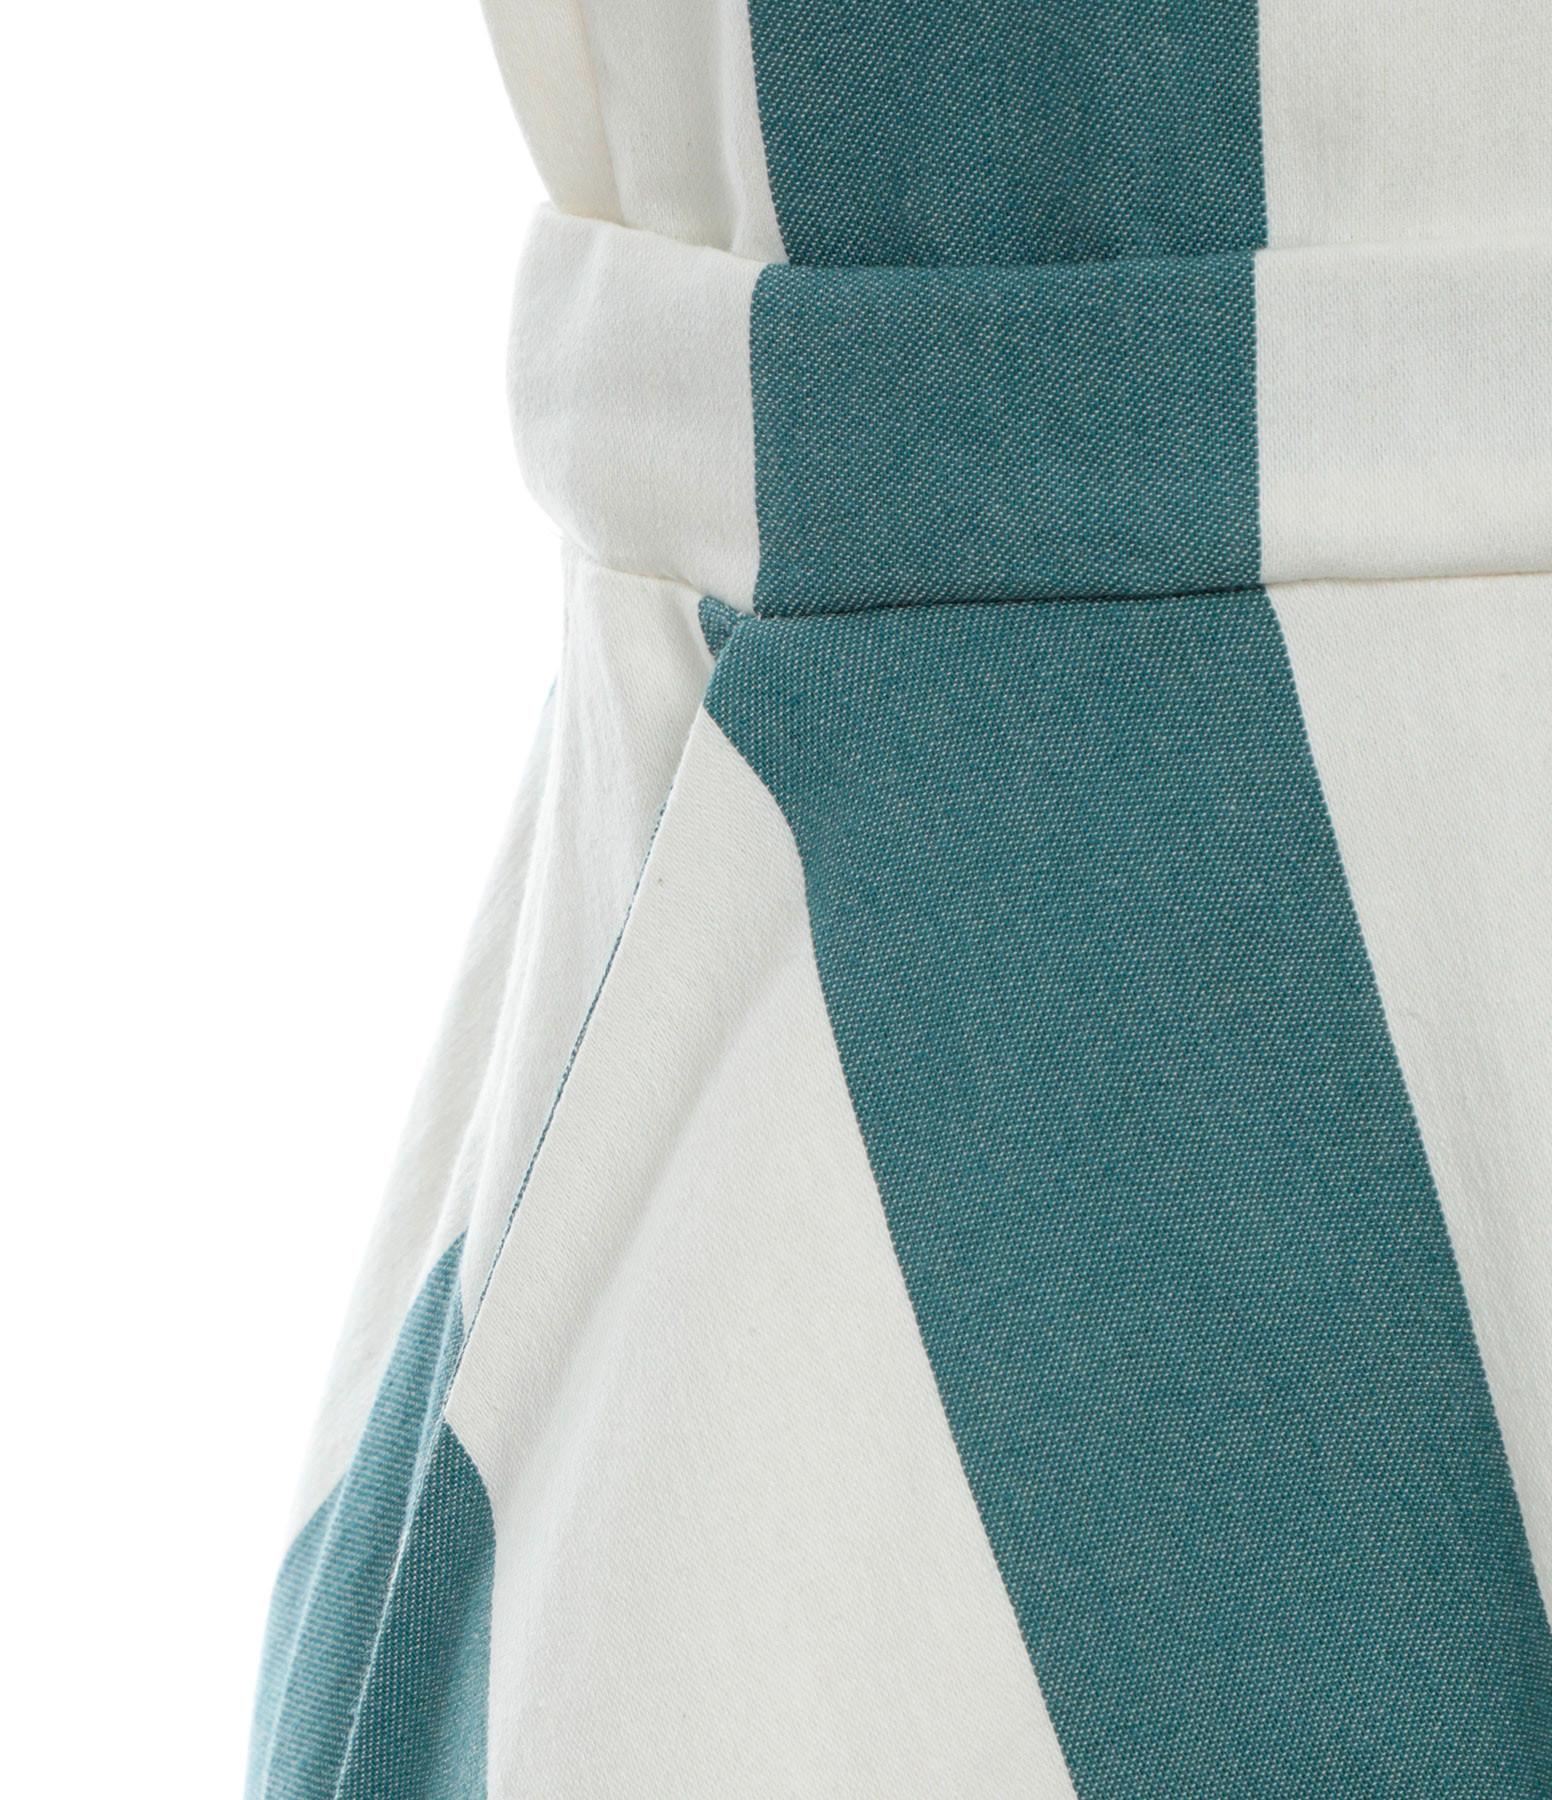 MODETROTTER - Robe Marion Coton Imprimé Escalier Bleu Écru